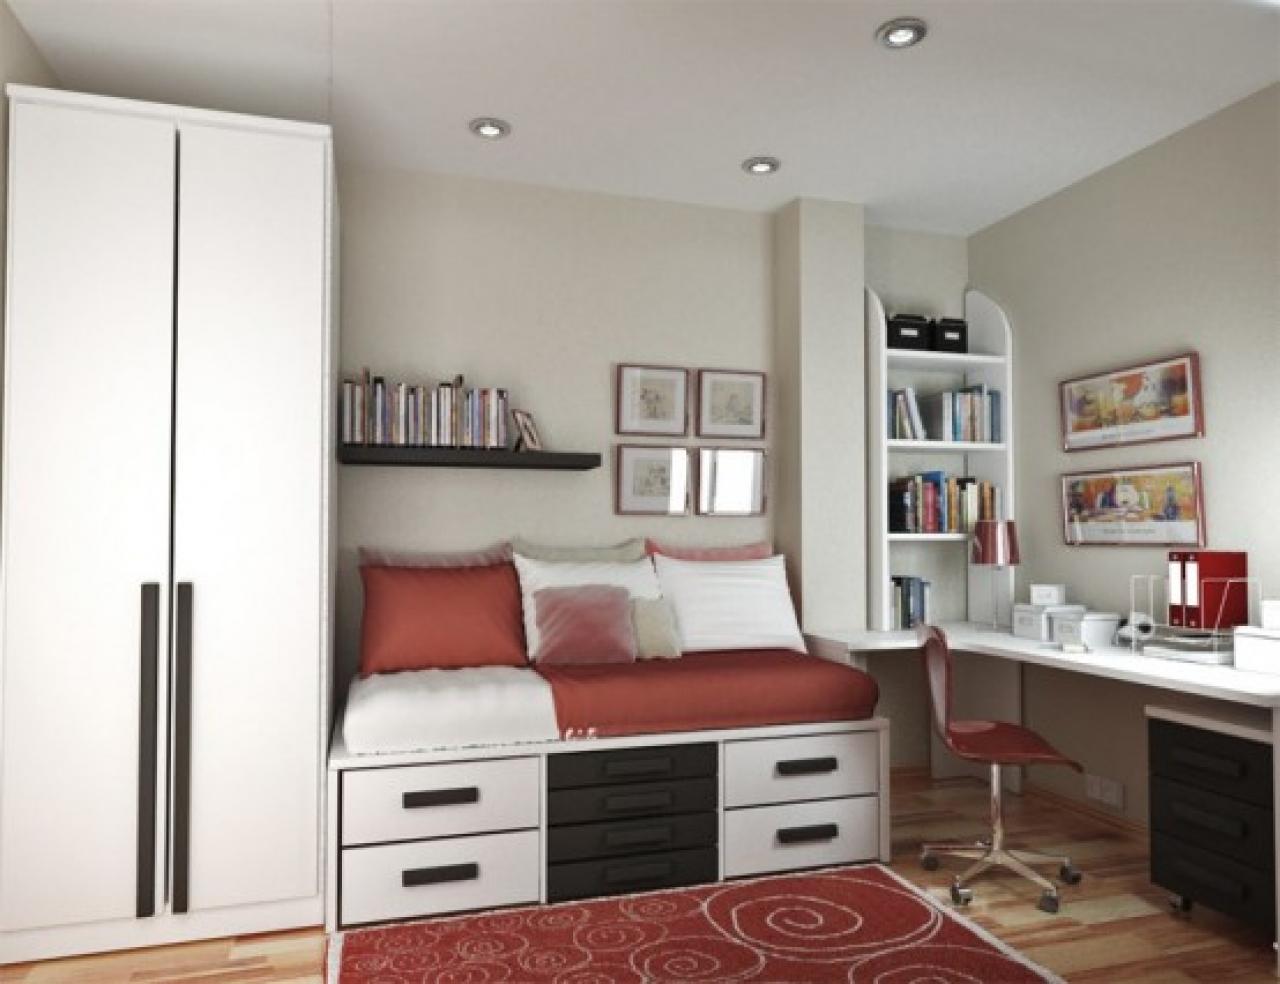 Simple Providing Sanctuary In Teenage Girl Bedroom (Image 9 of 10)